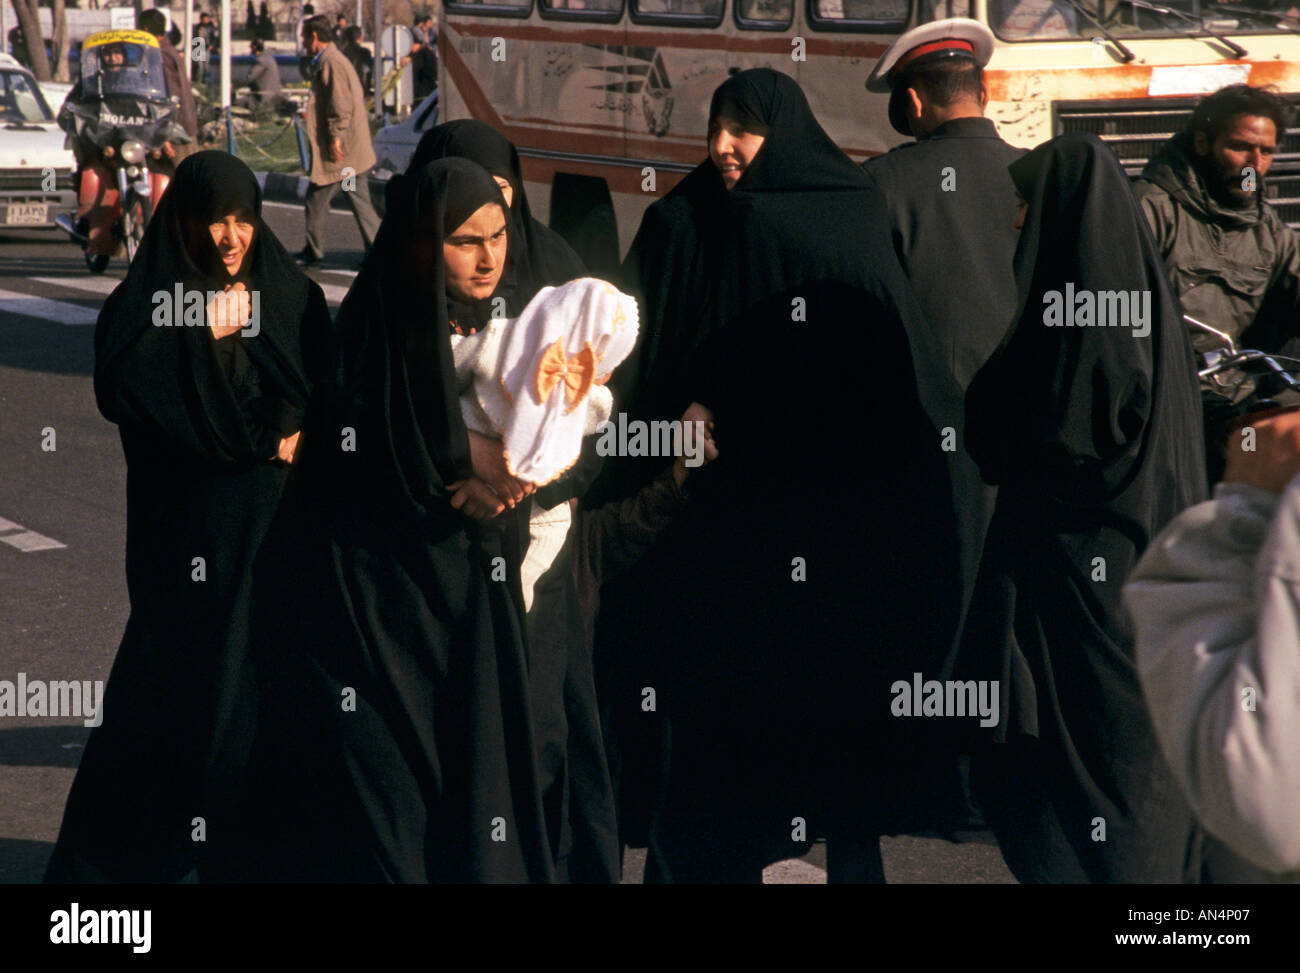 Women wearing burqas on a sreet in Tehran Iran - Stock Image